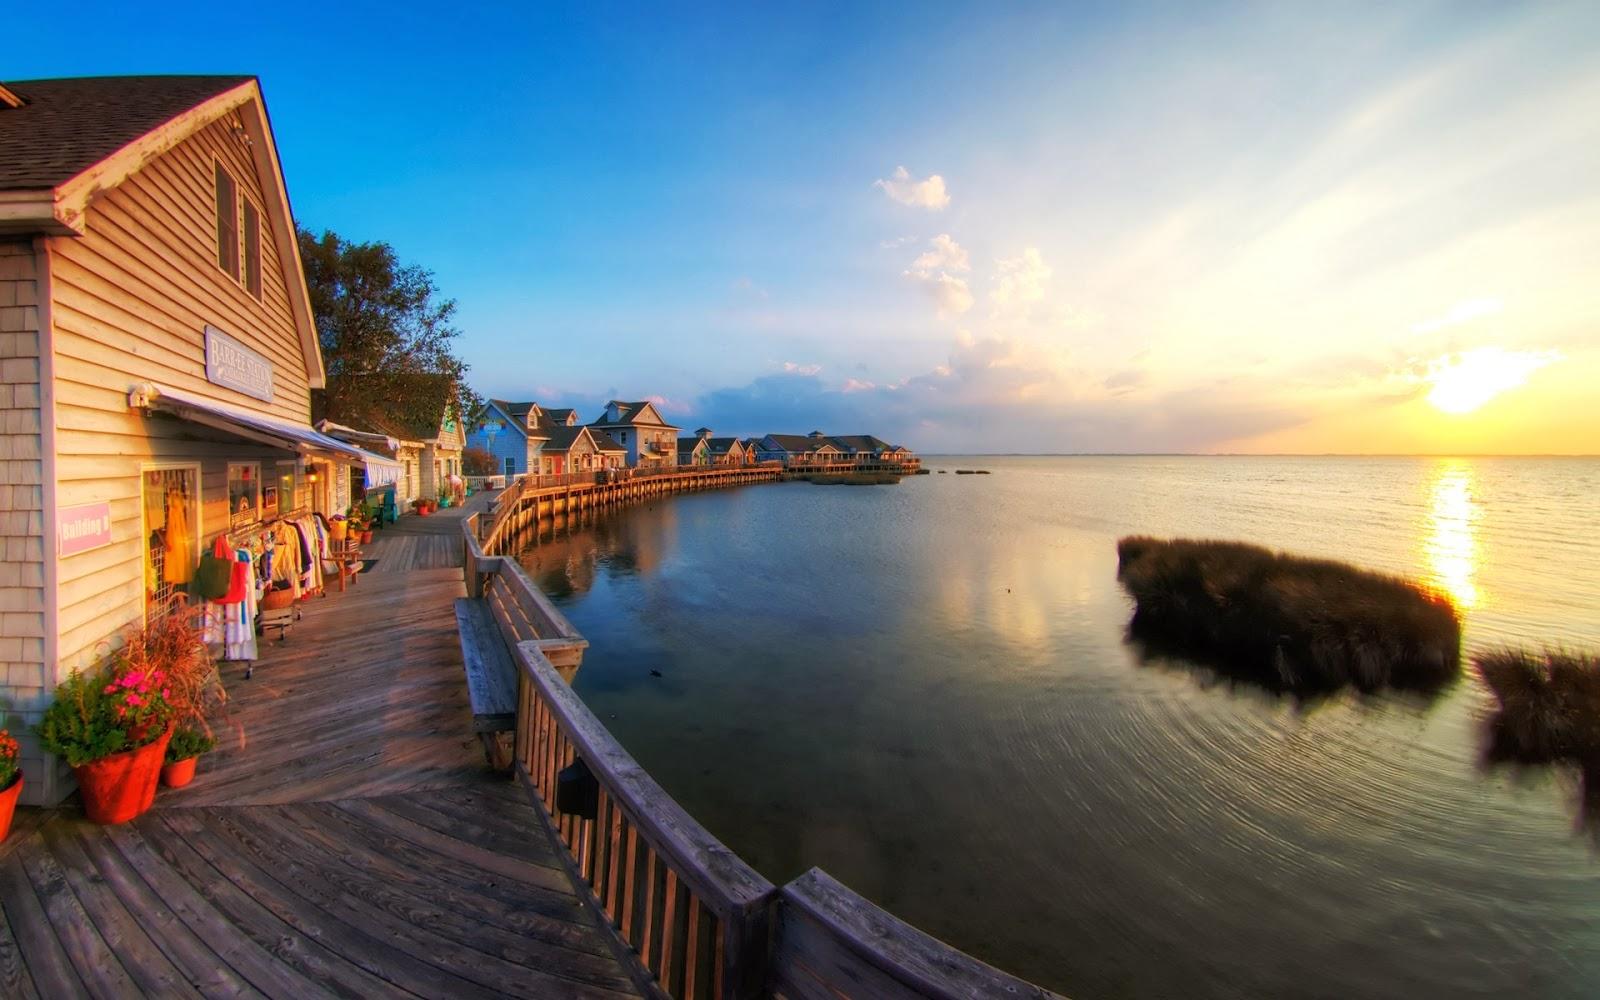 "<img src=""http://1.bp.blogspot.com/-xM5tEsWOw6M/Ut7WSTeTKRI/AAAAAAAAJsA/Ke0mmlfzsgg/s1600/beautiful-sunset.jpg"" alt=""beautiful sunset"" />"